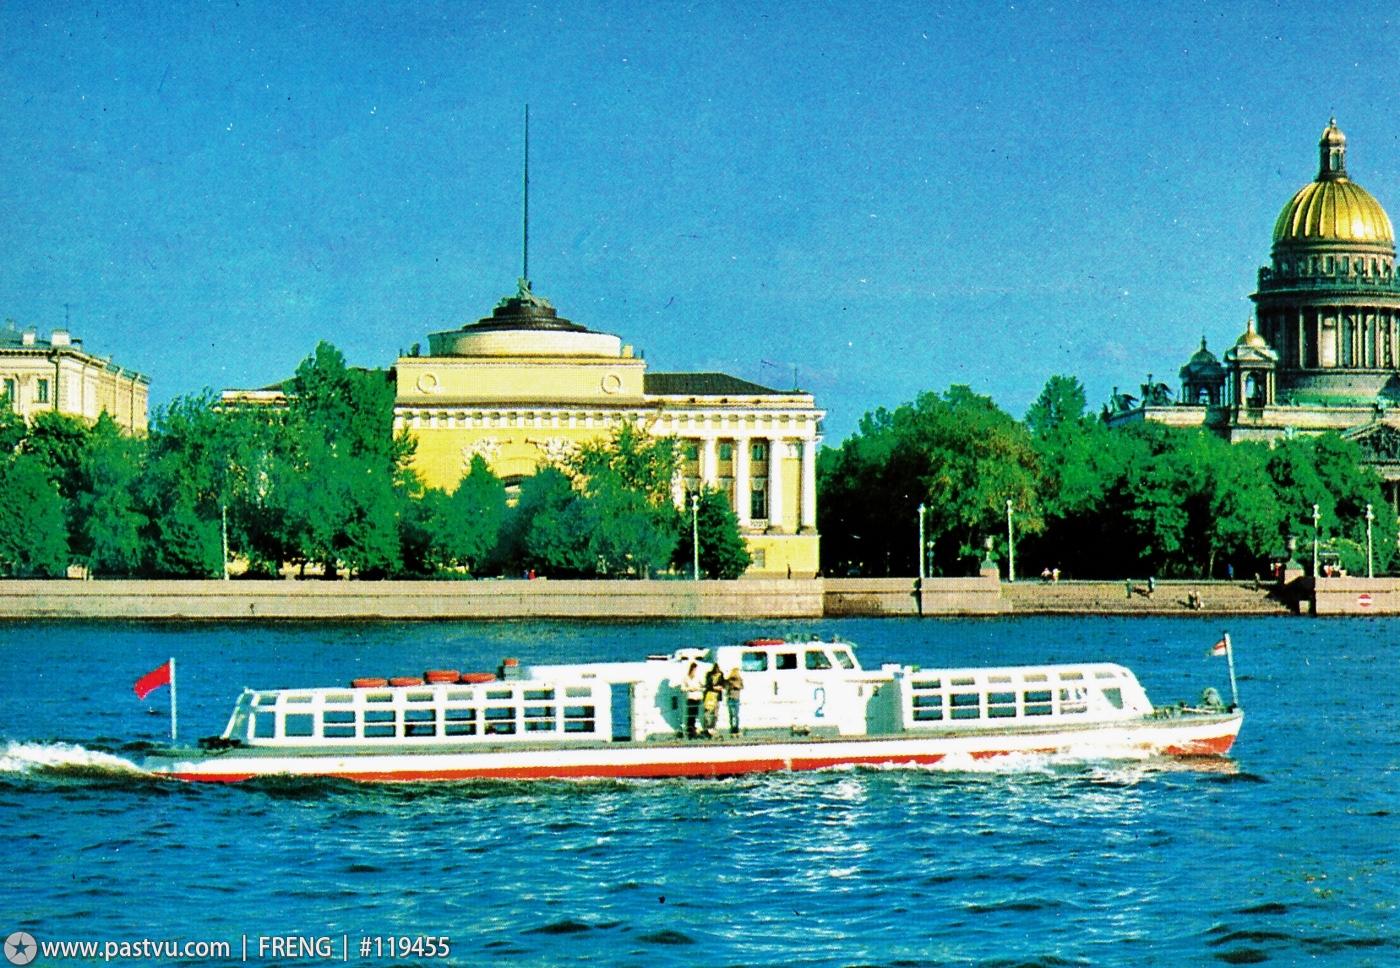 1979 Вид на павильон Адмиралтейства.jpg